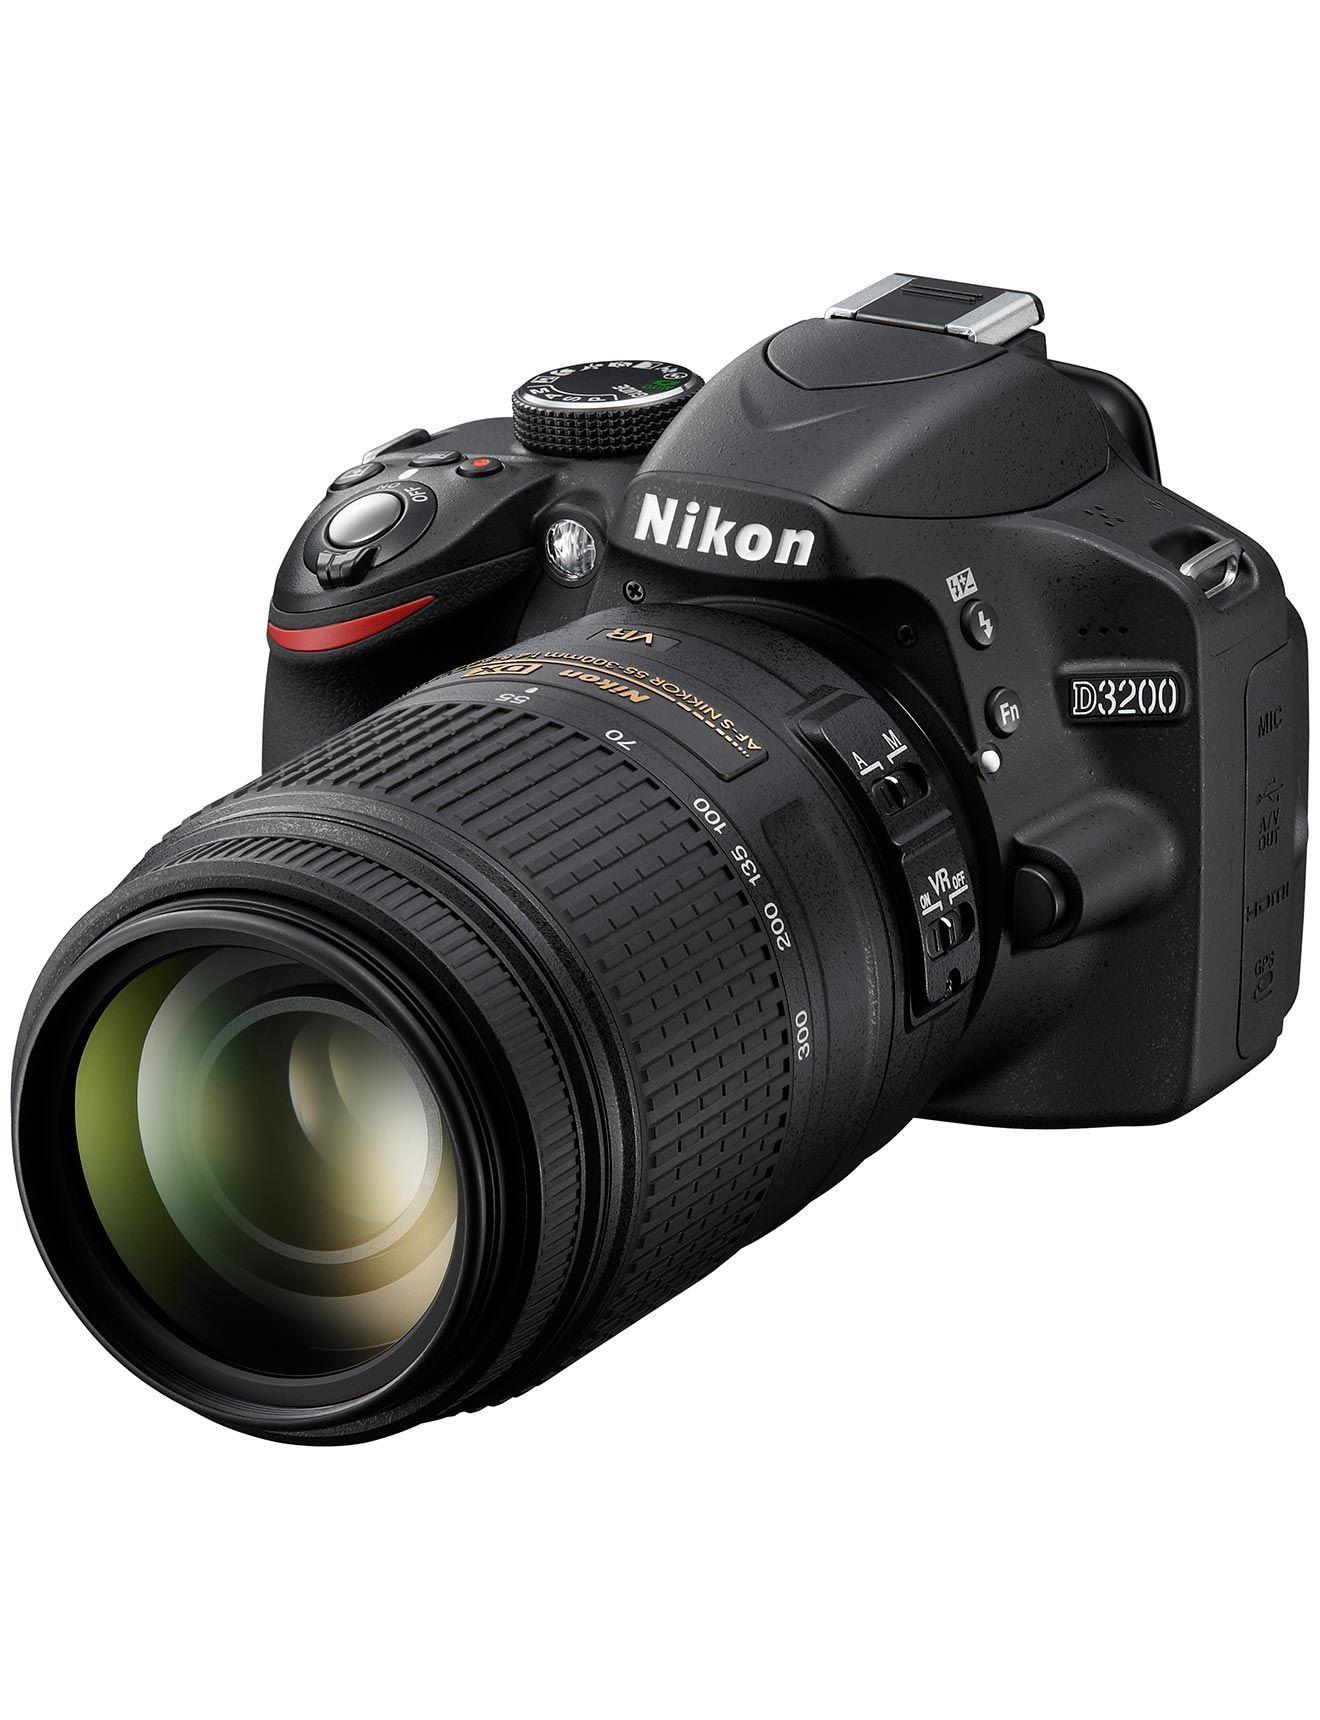 Nikon D3200 24 2 Megapixel Digital Slr Camera Summer Travel Accessories Davidjones Jasondundas Celebrities Nikon D3200 Nikon Digital Camera Camera Nikon